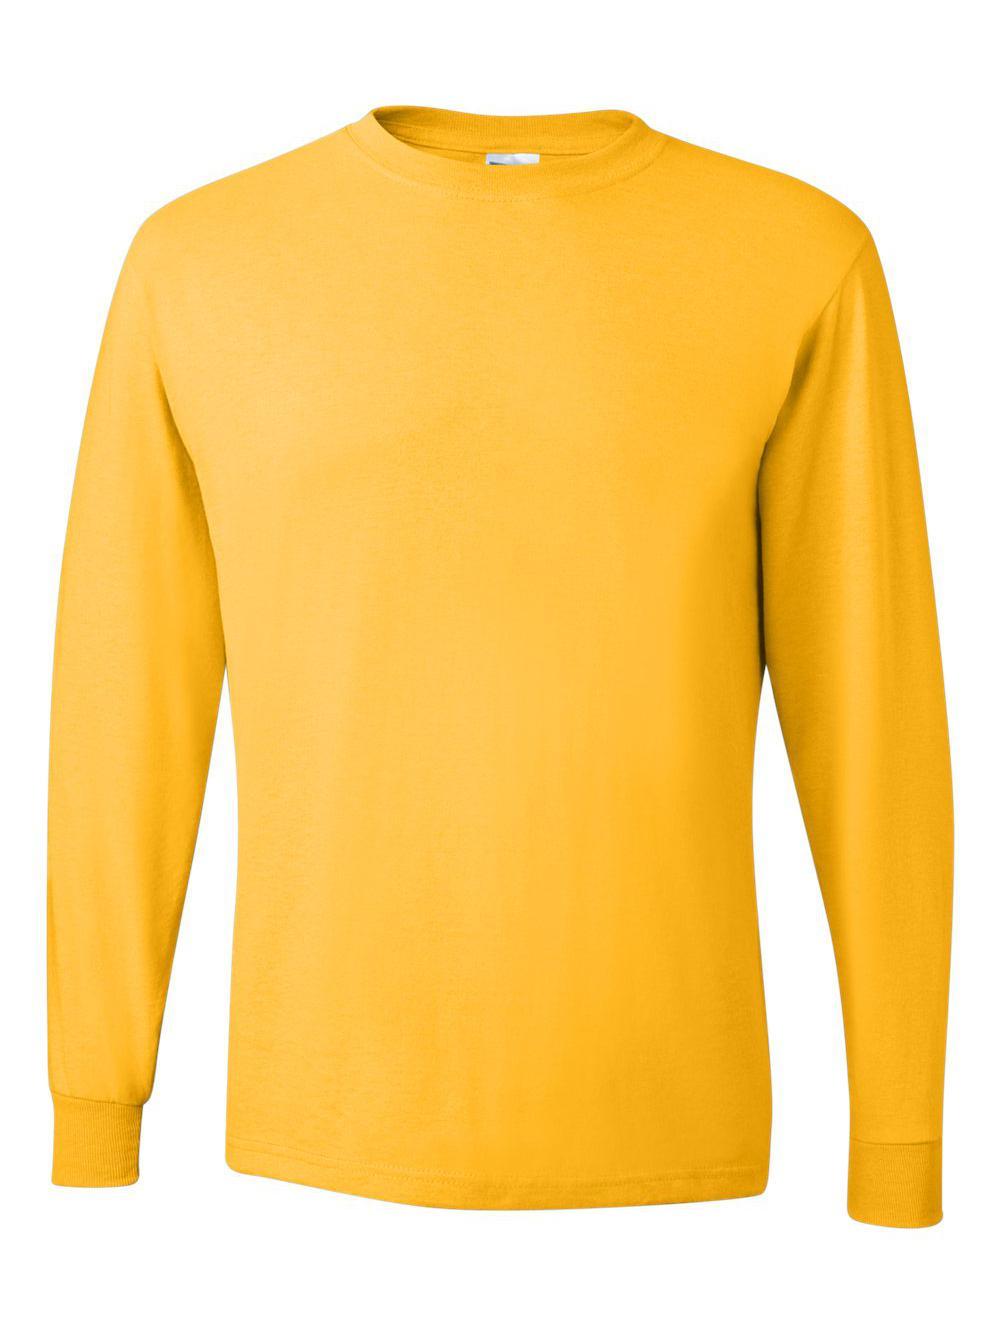 Jerzees-Dri-Power-Long-Sleeve-50-50-T-Shirt-29LSR thumbnail 42